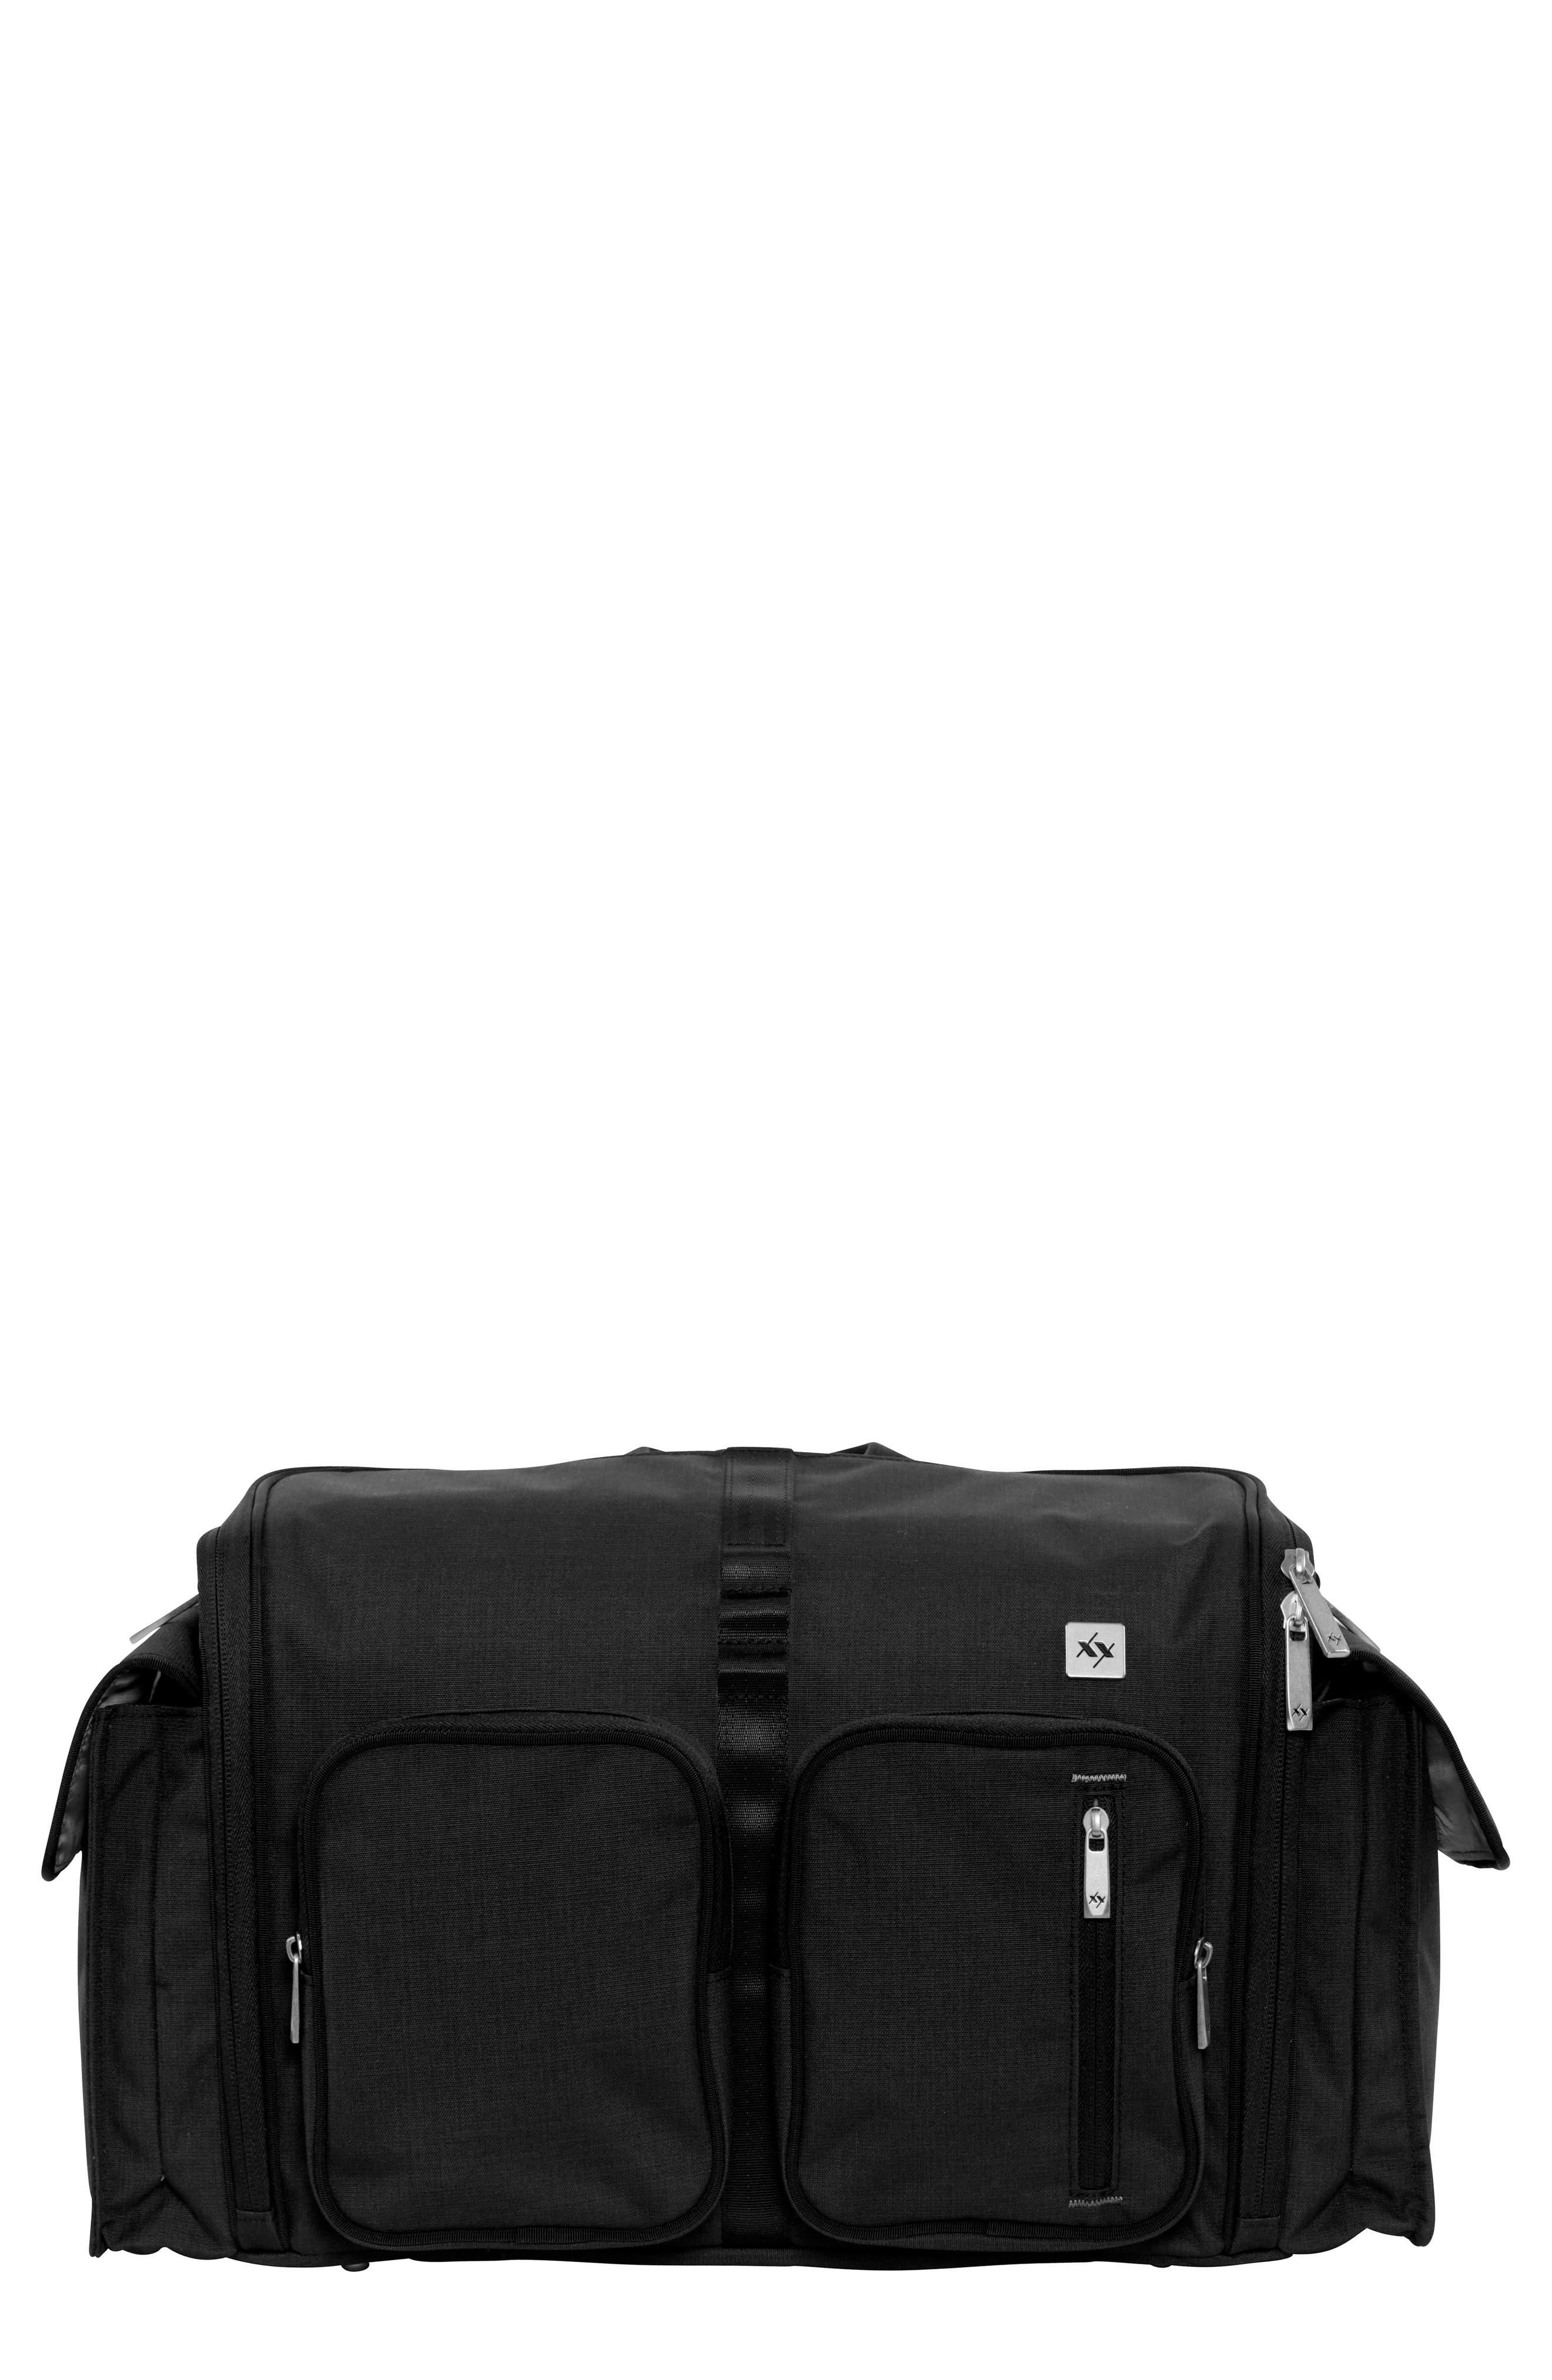 XY Clone Diaper Bag,                         Main,                         color, CARBON